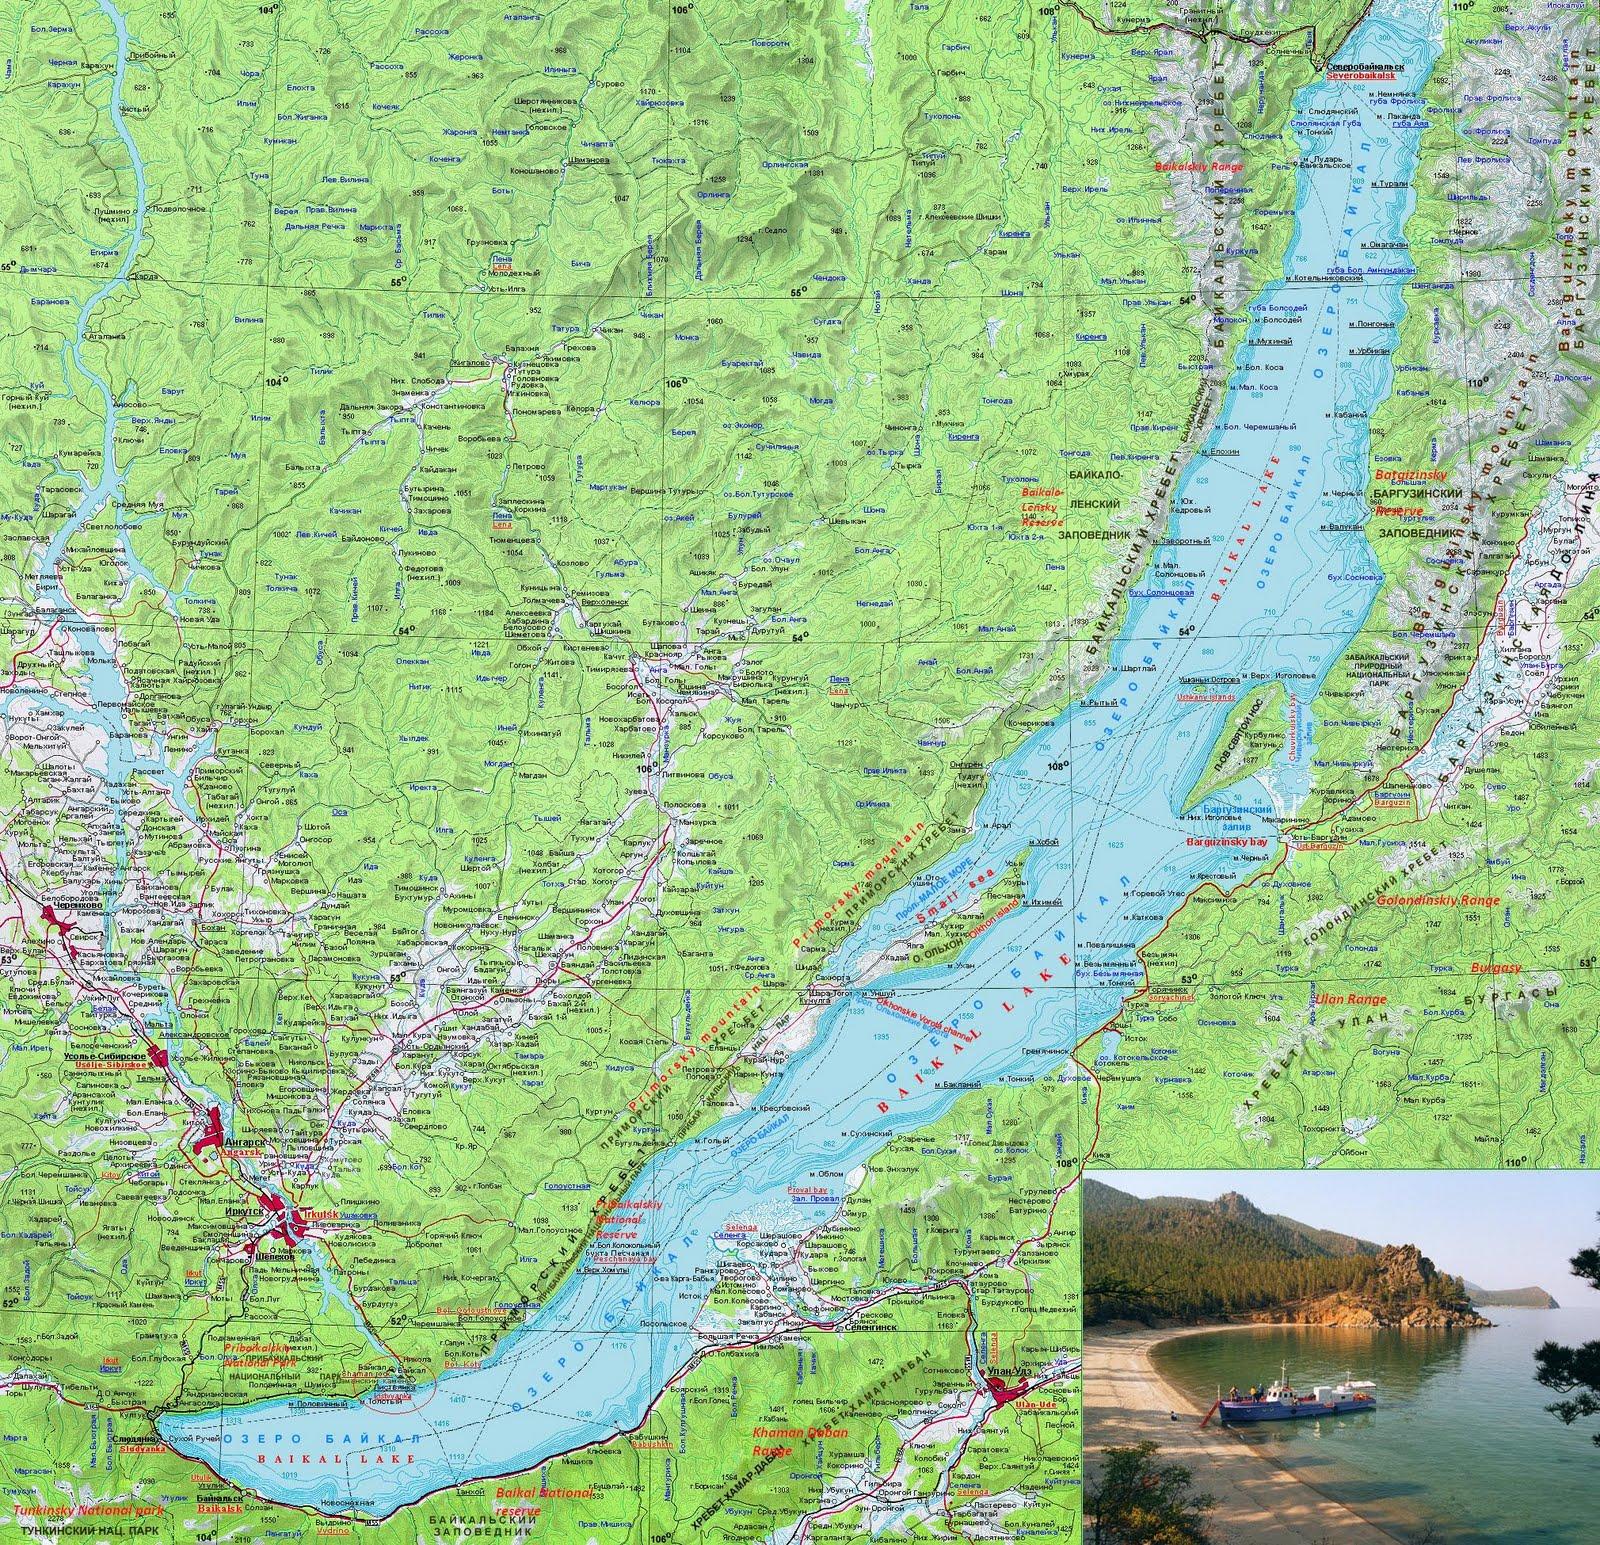 Lake Baikal World Map.Lake Baikal On World Map Pics Download